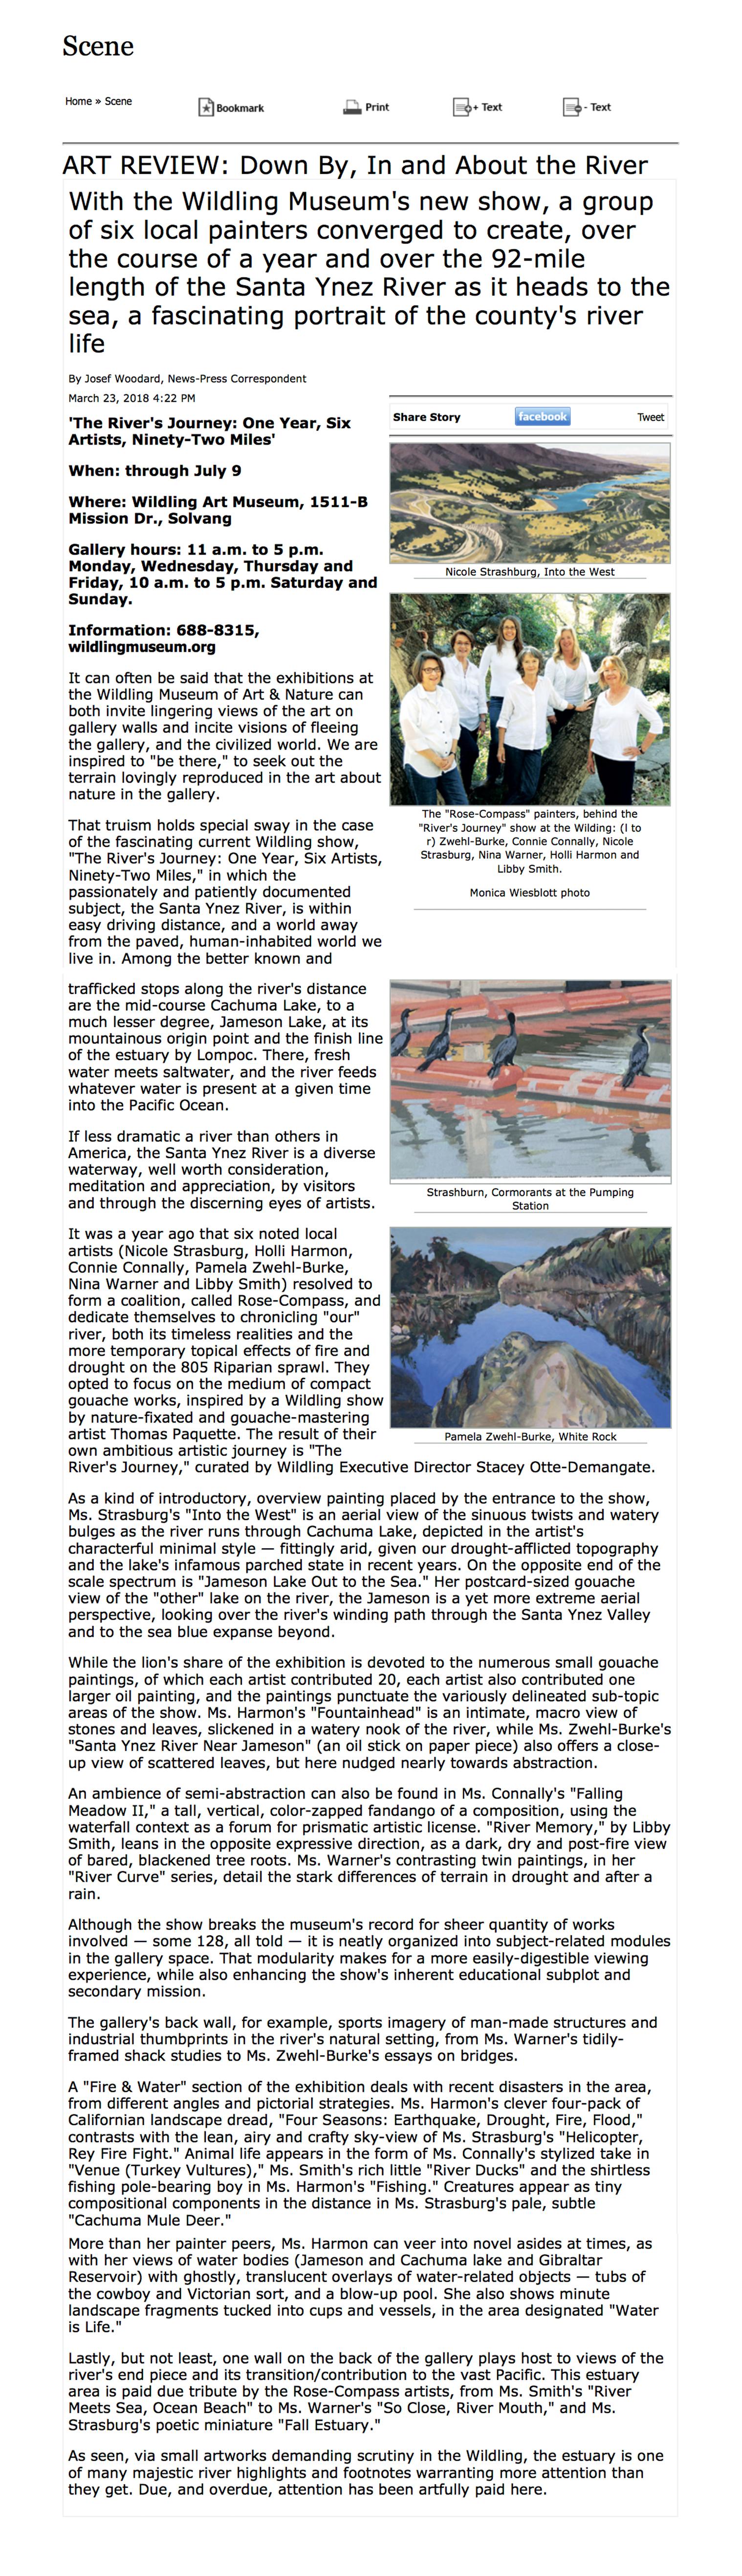 SBNP-Woodard Review.jpg